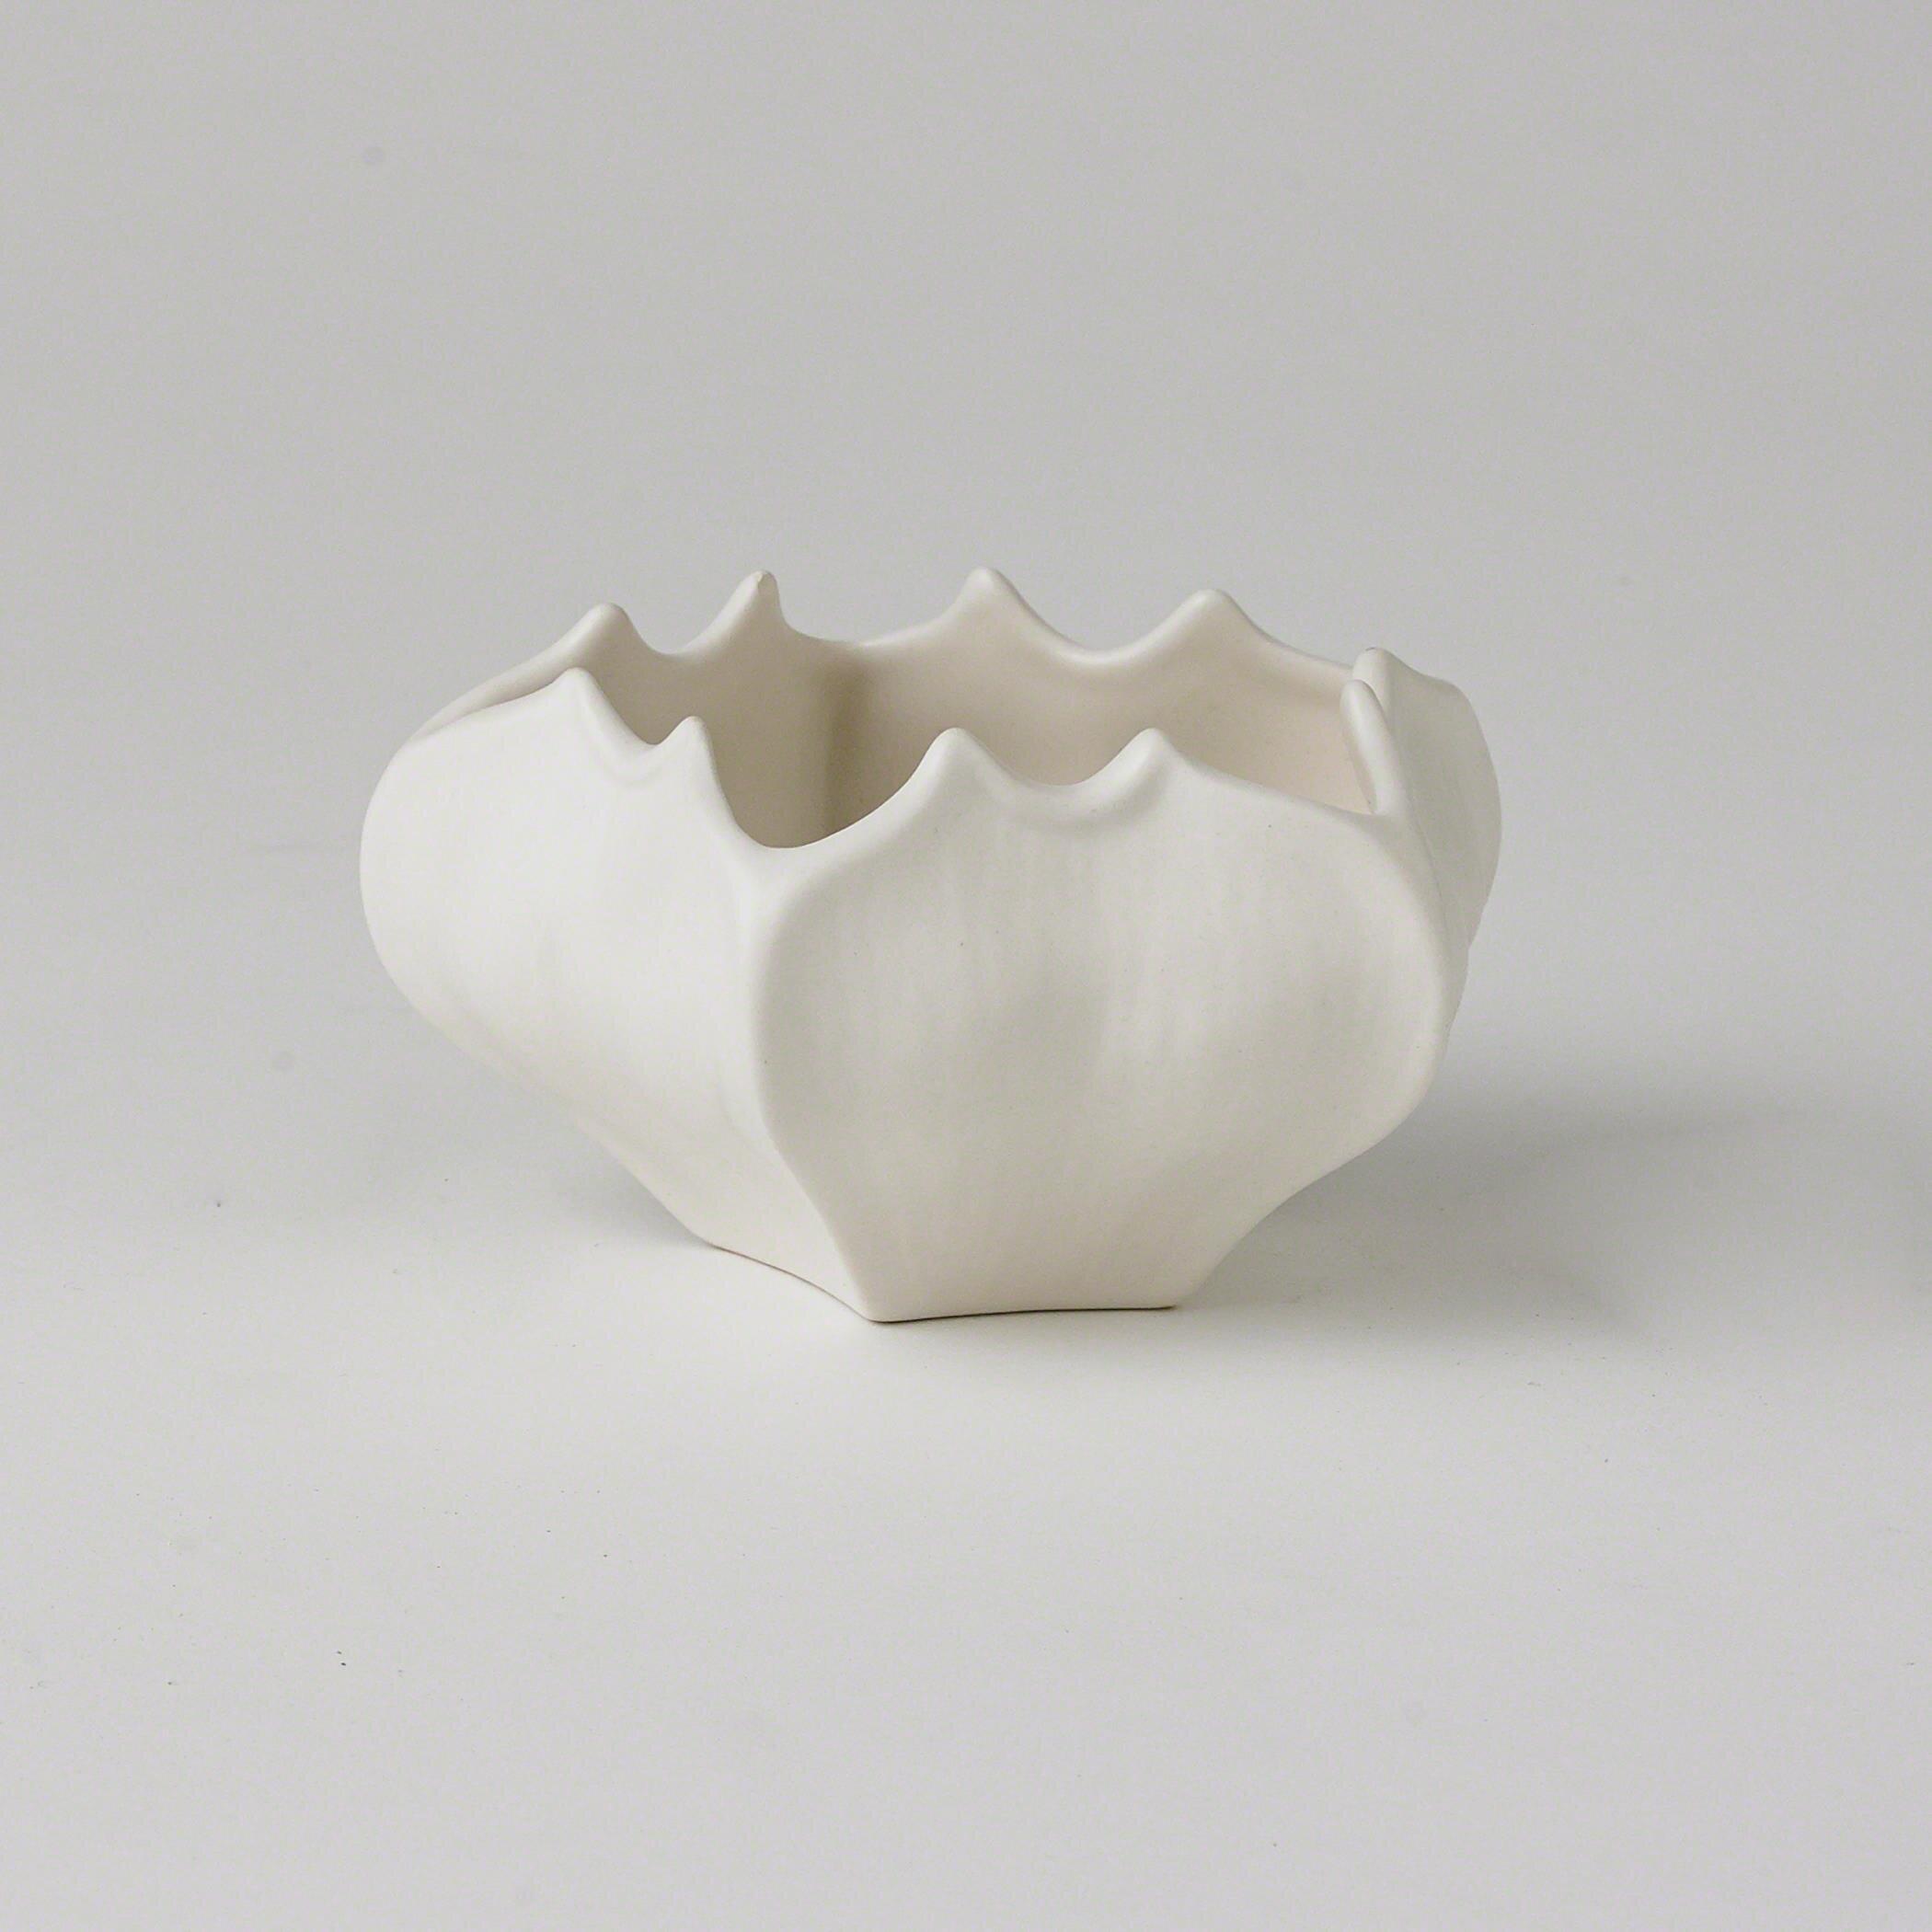 Studio A Star Fruit Ceramic Abstract Farmhouse Decorative Bowl In Matte White Reviews Wayfair